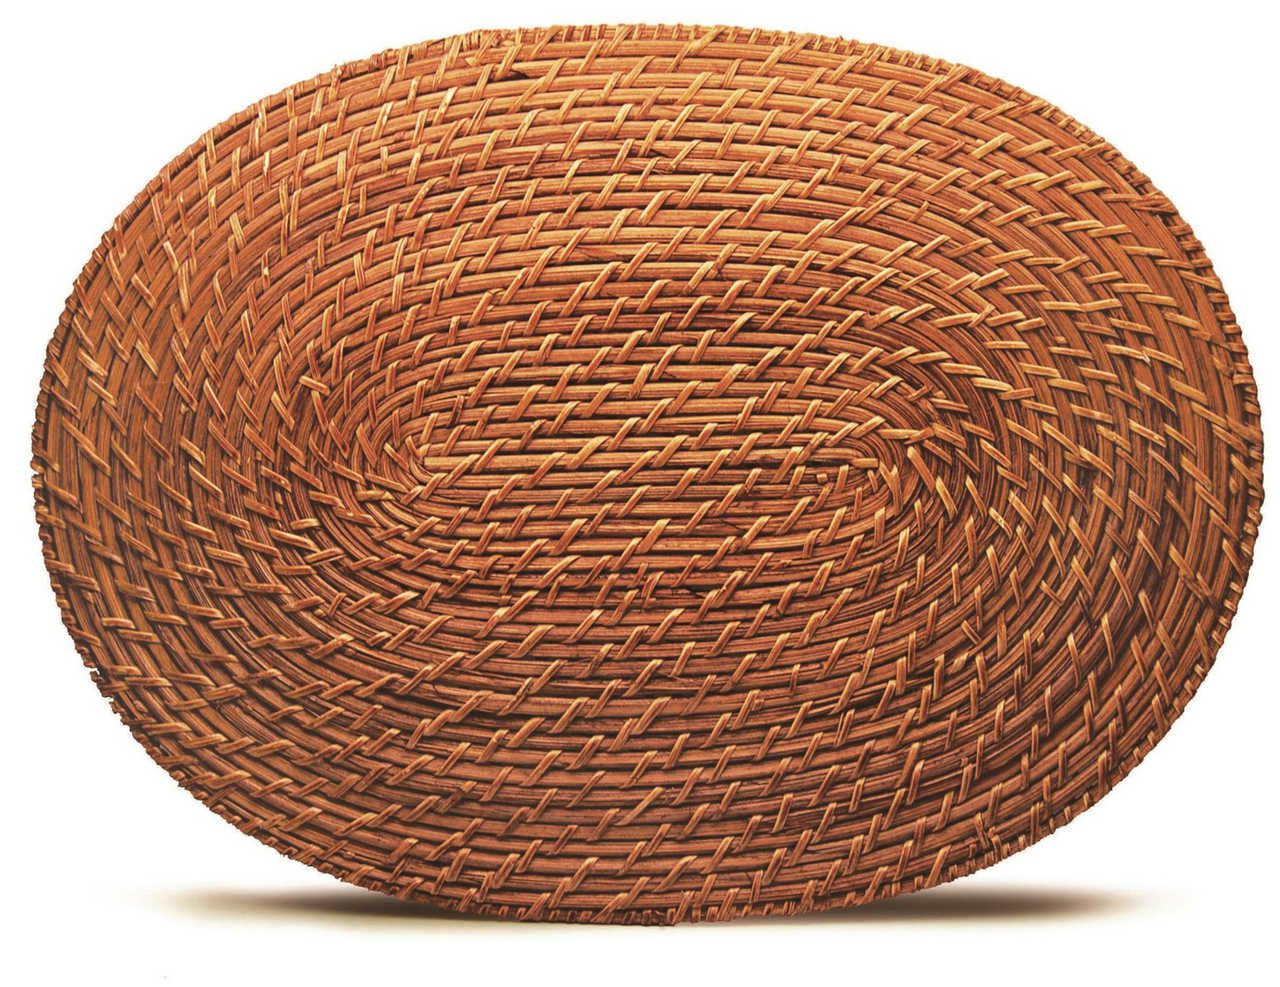 Descanso de travessa Rattan Oval 45x32cm - Tyft Organic